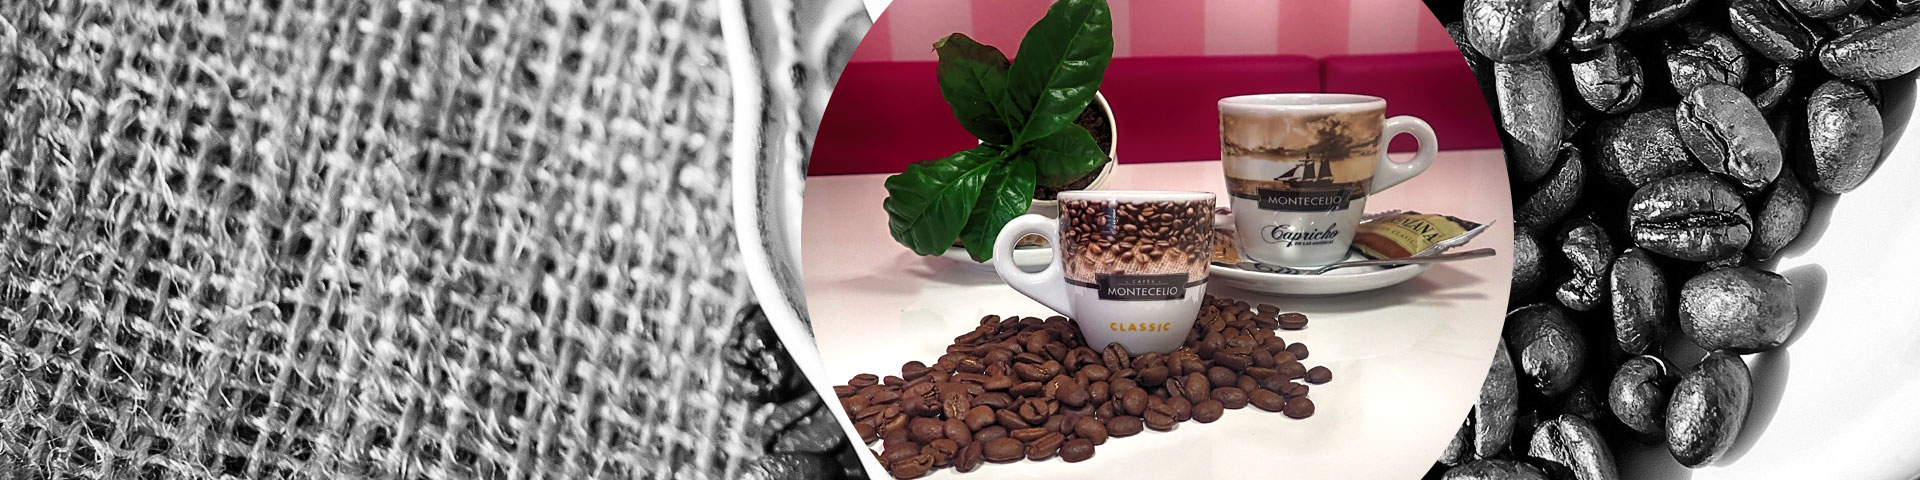 uvod_kafe